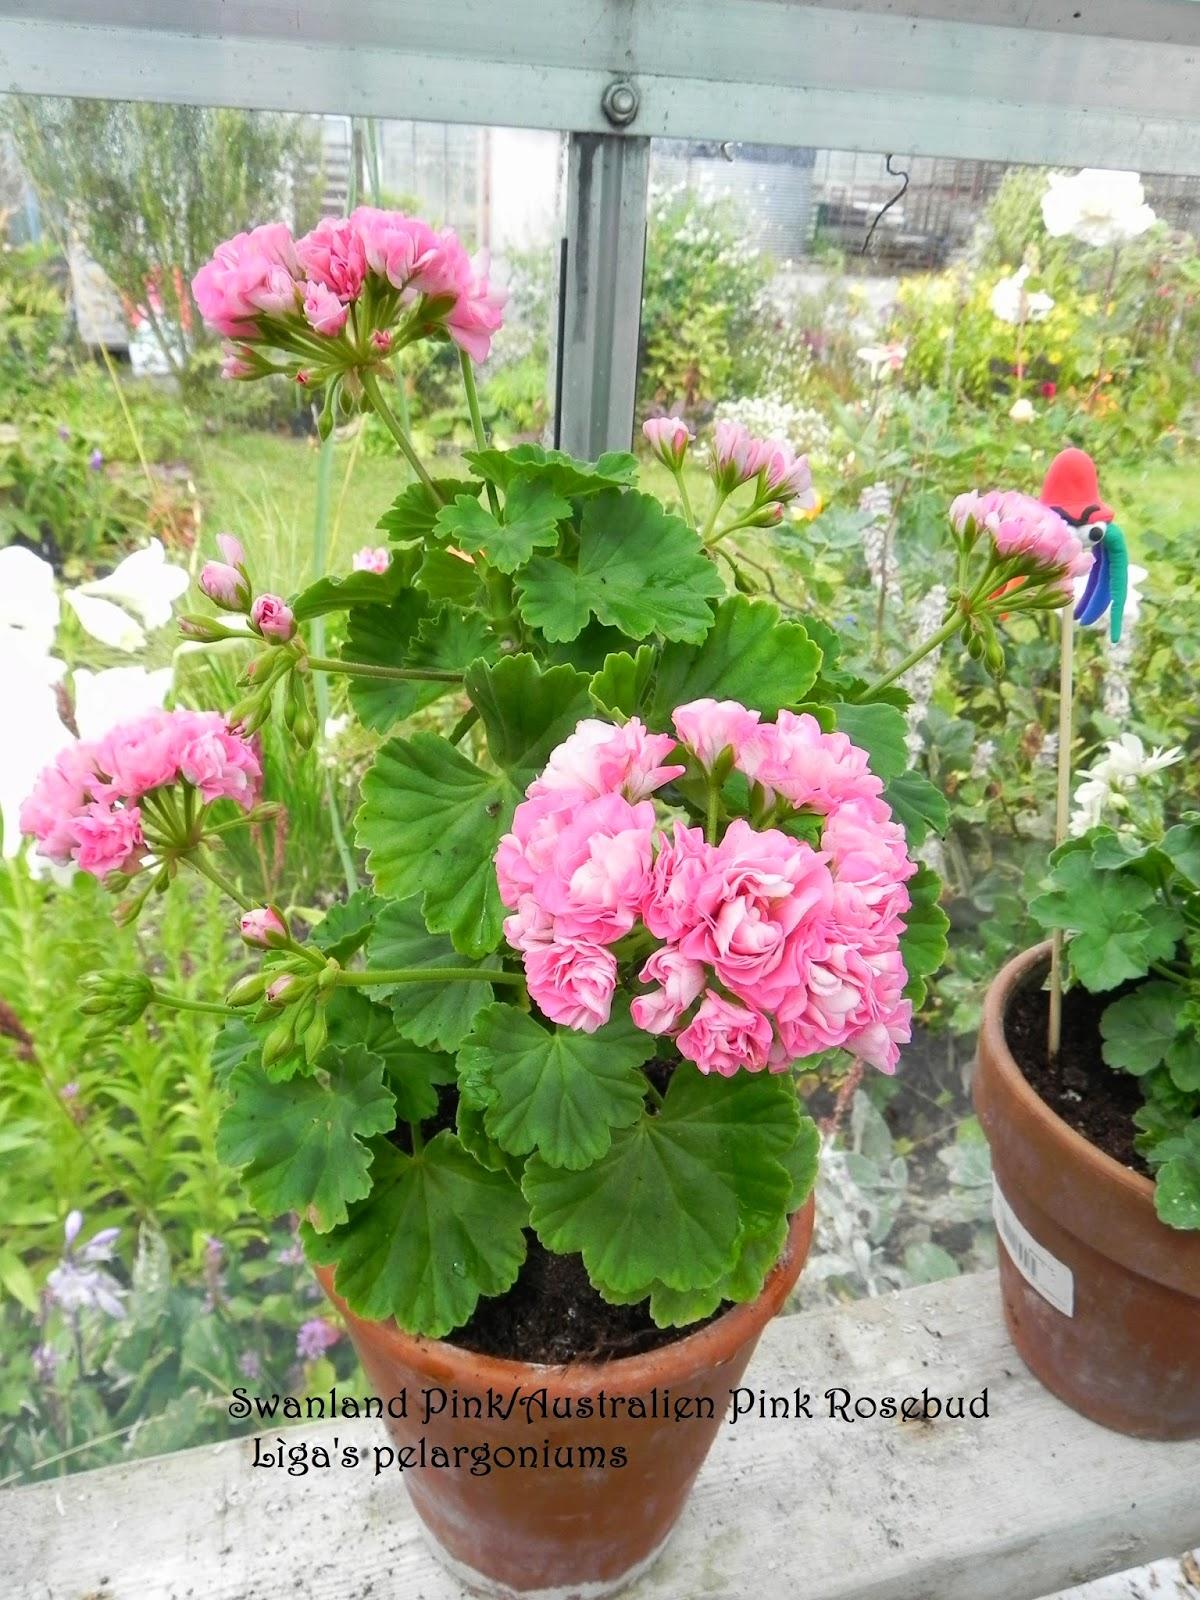 10PCS Swanland Pink Australien Pink Rosebud Zonal Geranium Flower Seeds